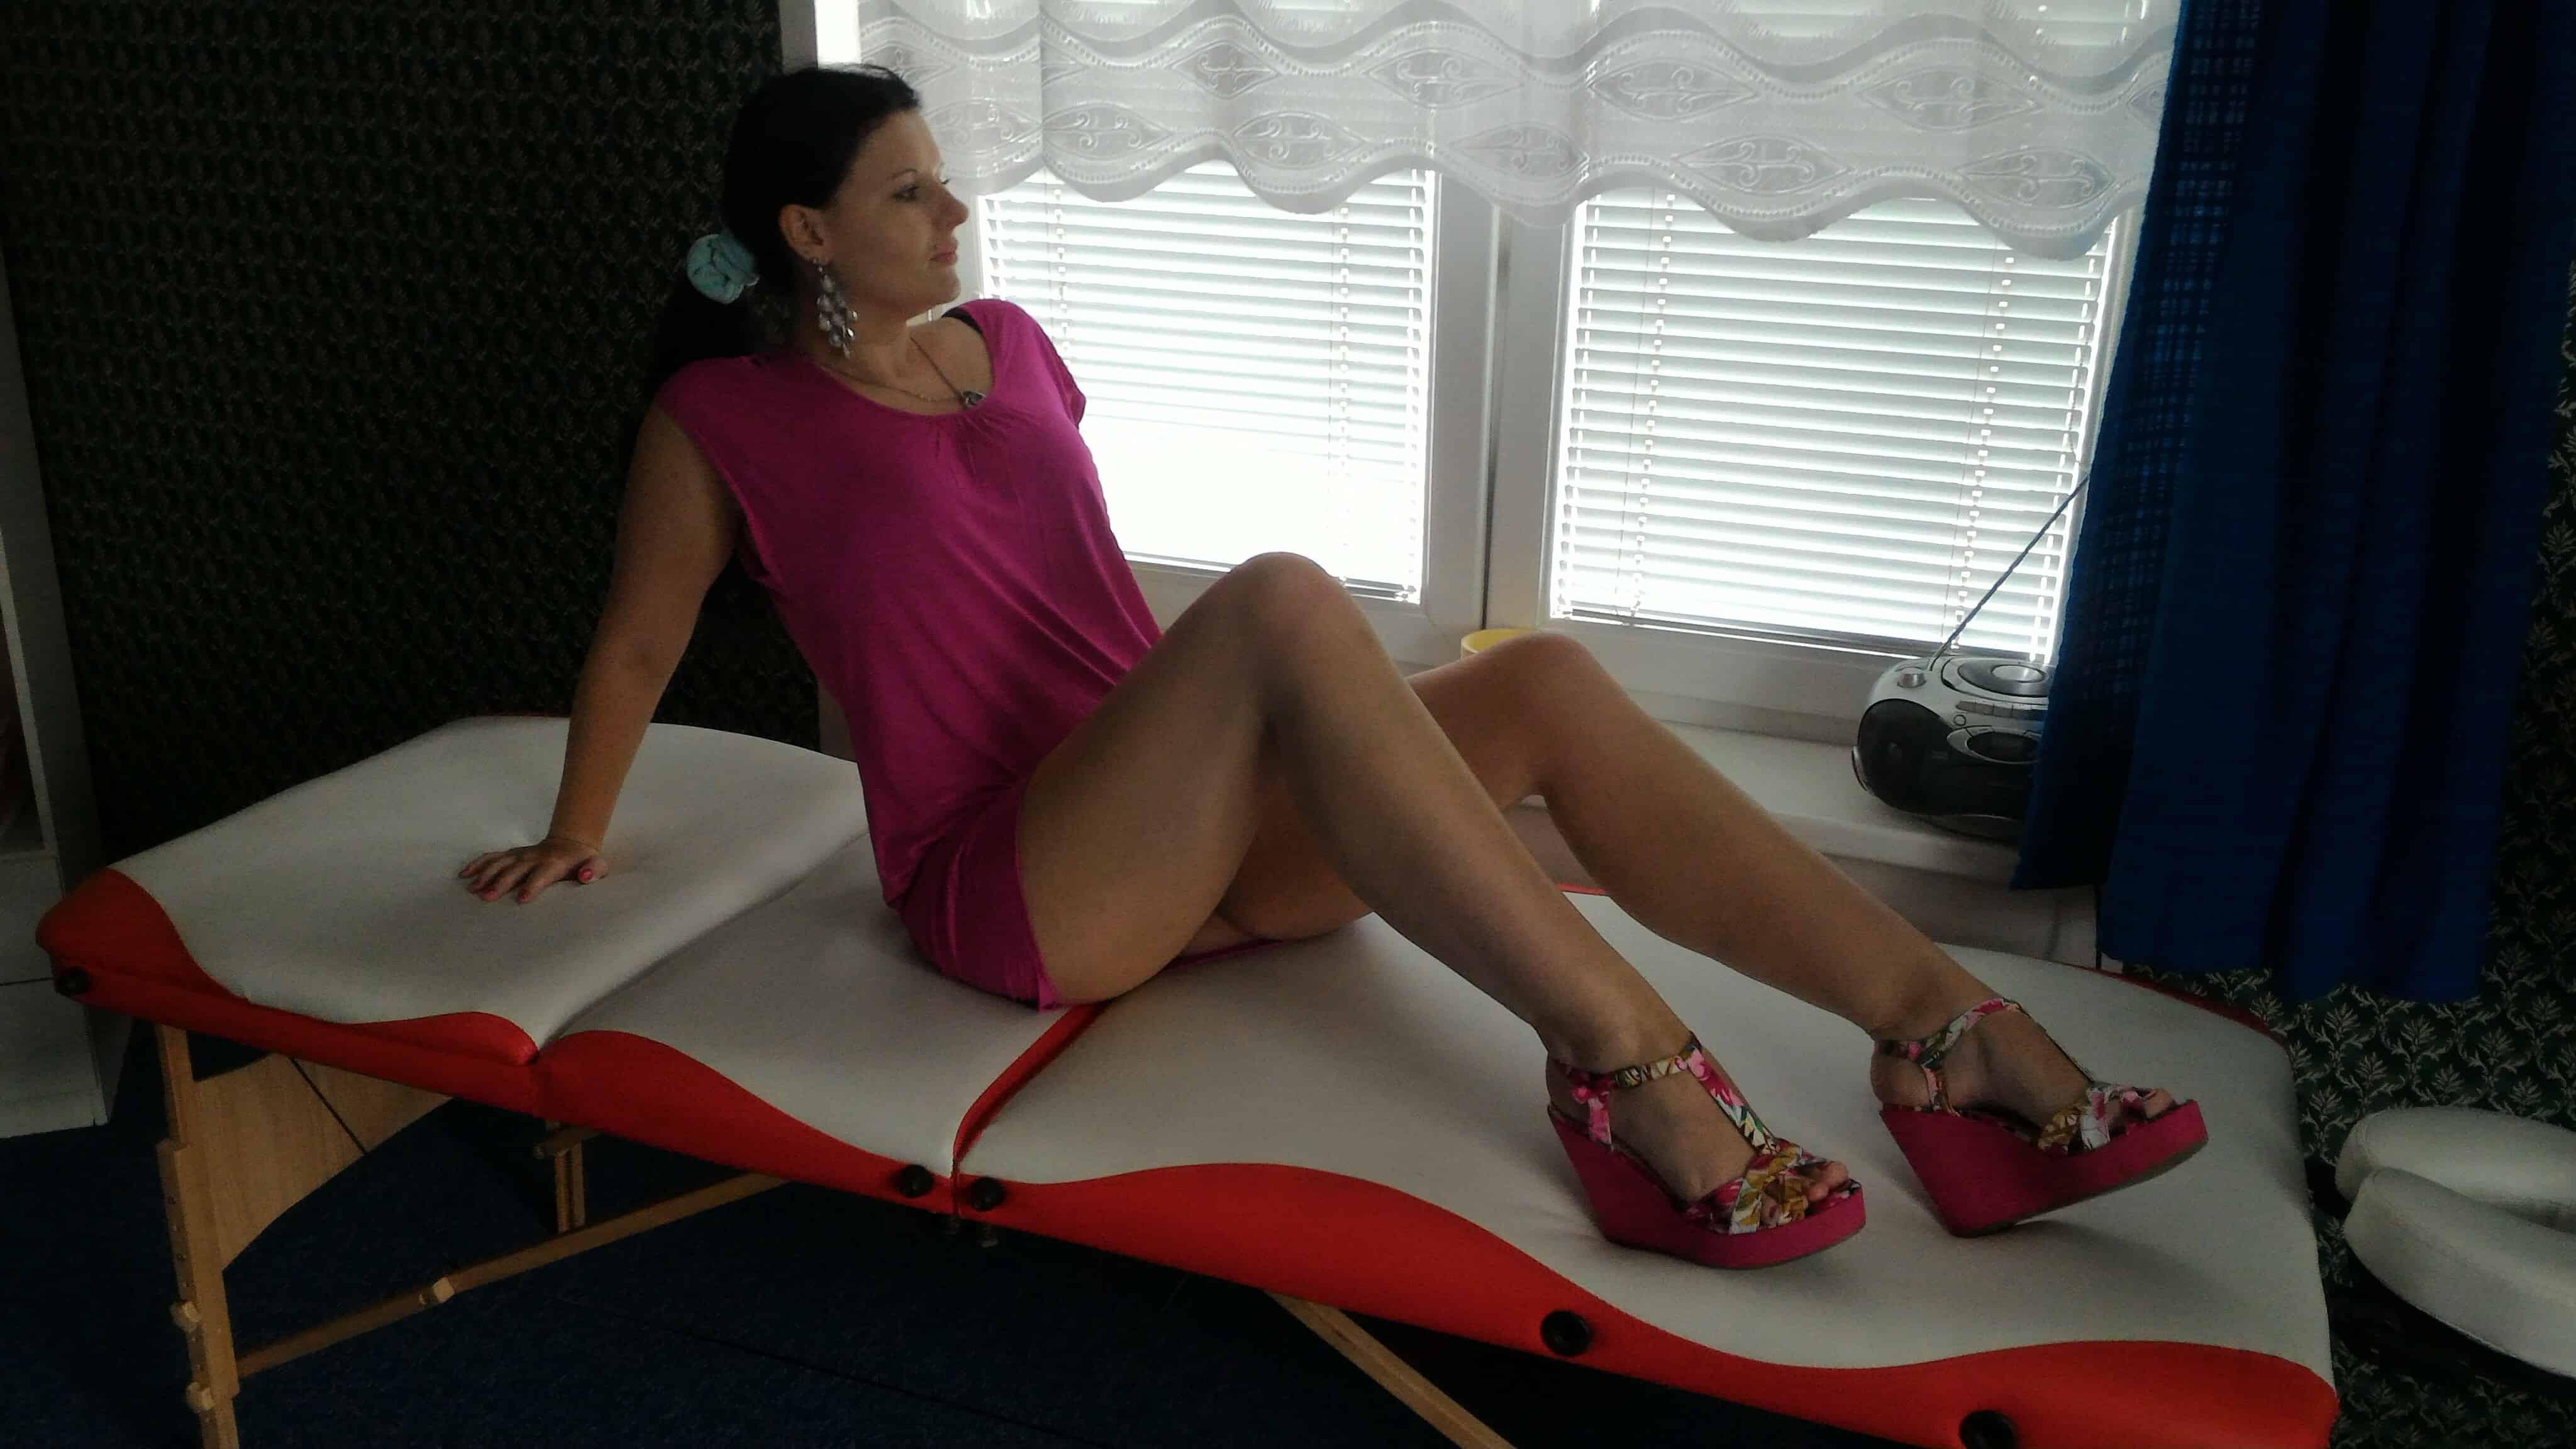 eroticke masaze brno mrdani cz